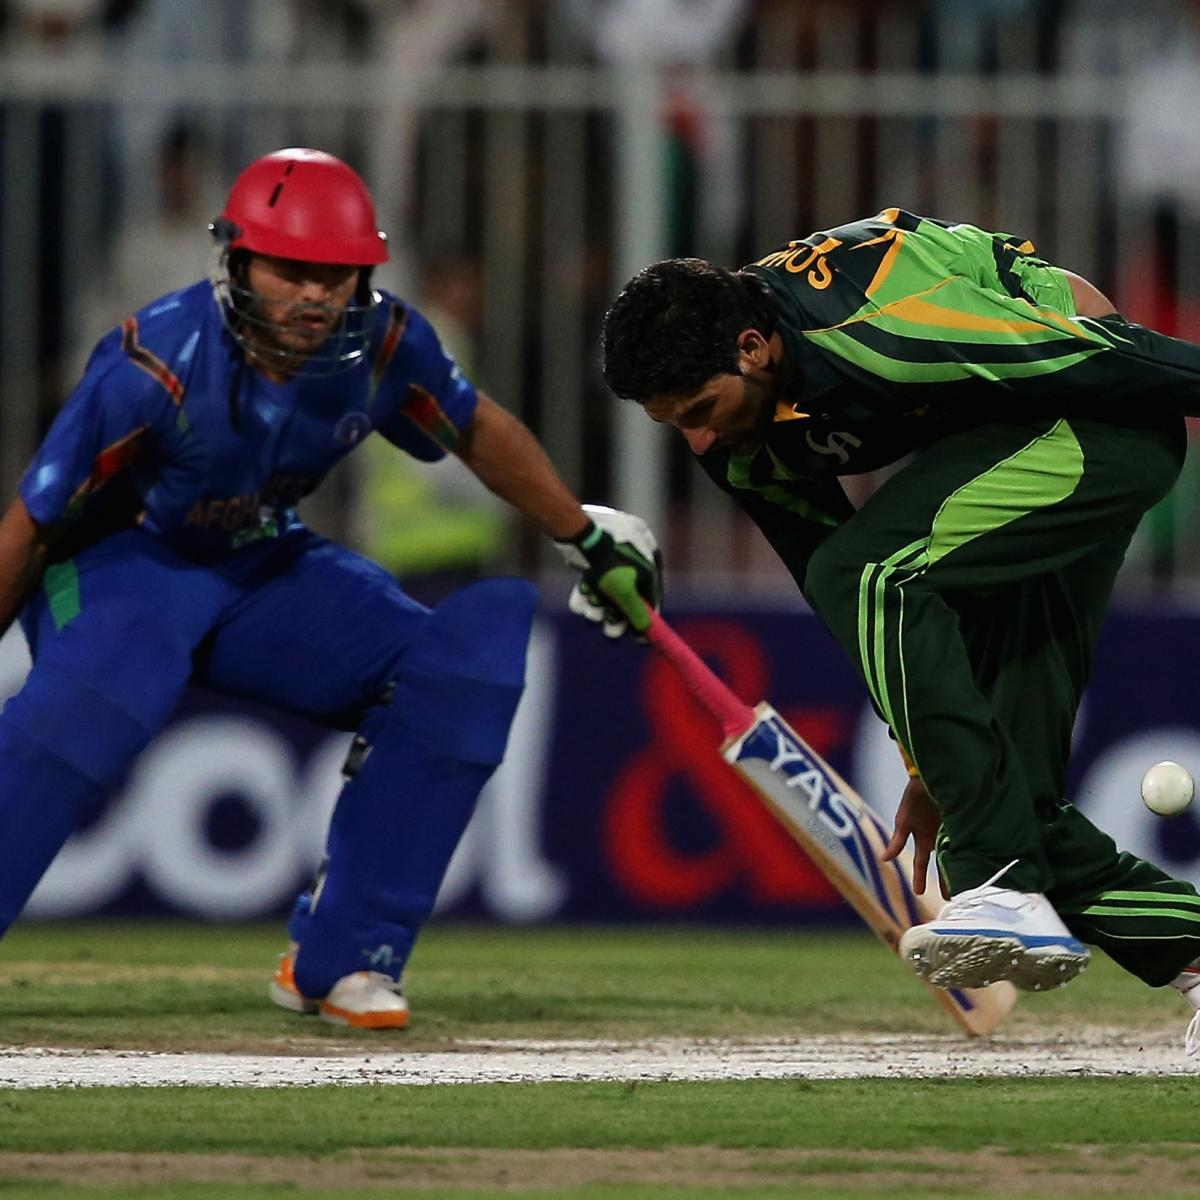 pakistan vs afghanistan - HD1200×1200